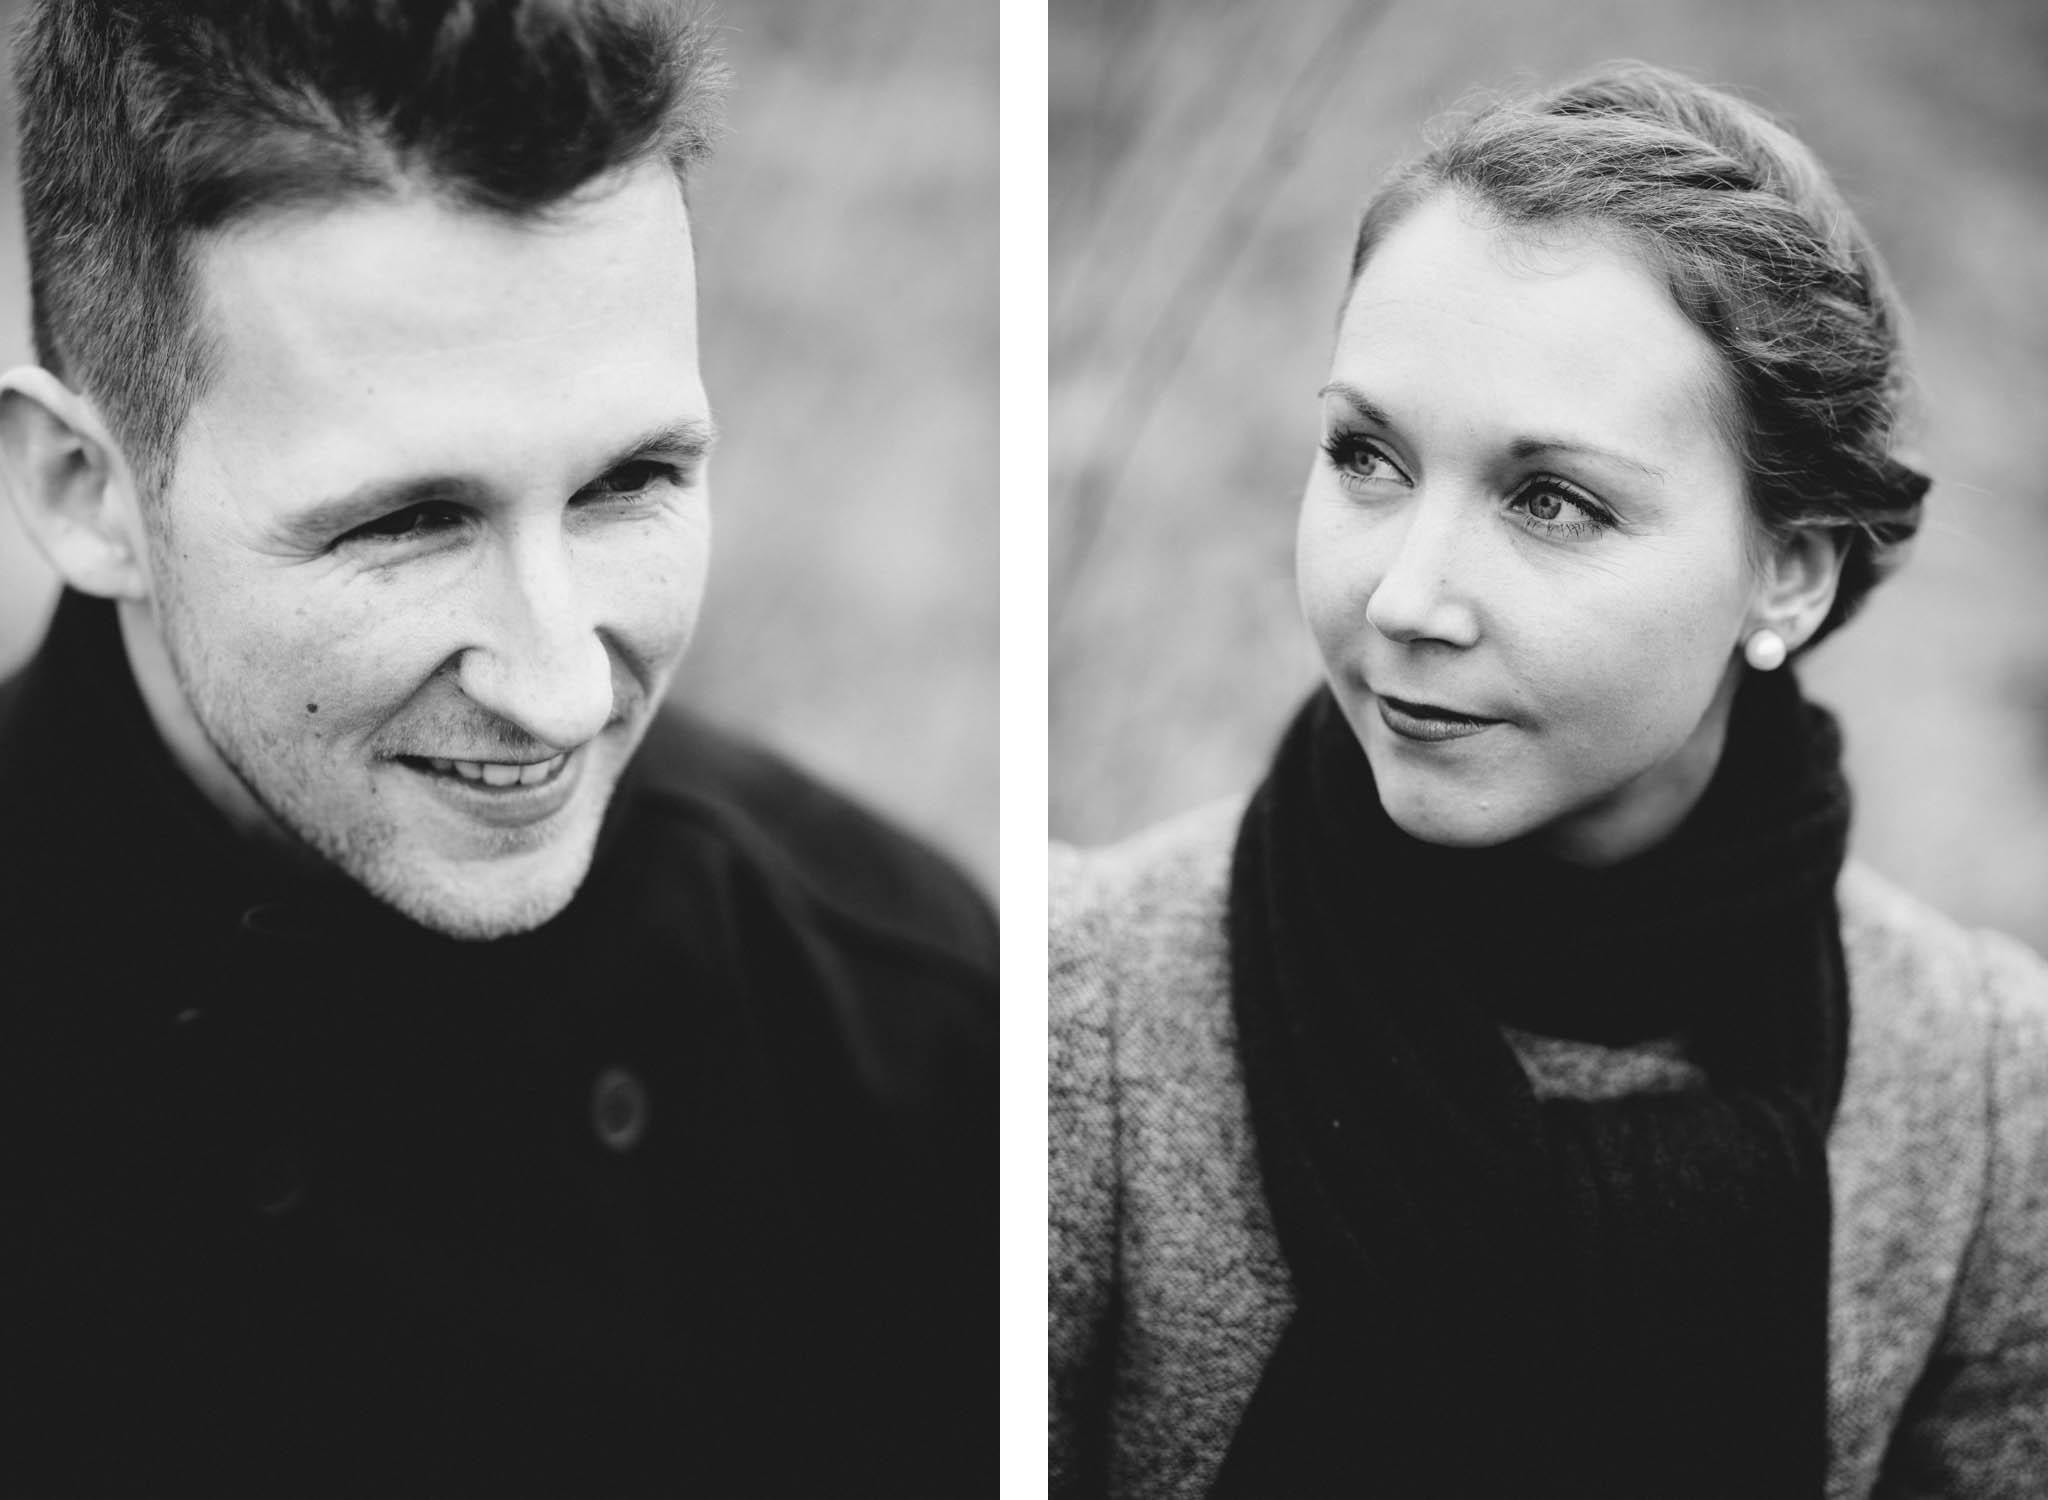 portraits-schwarzweiss-paar